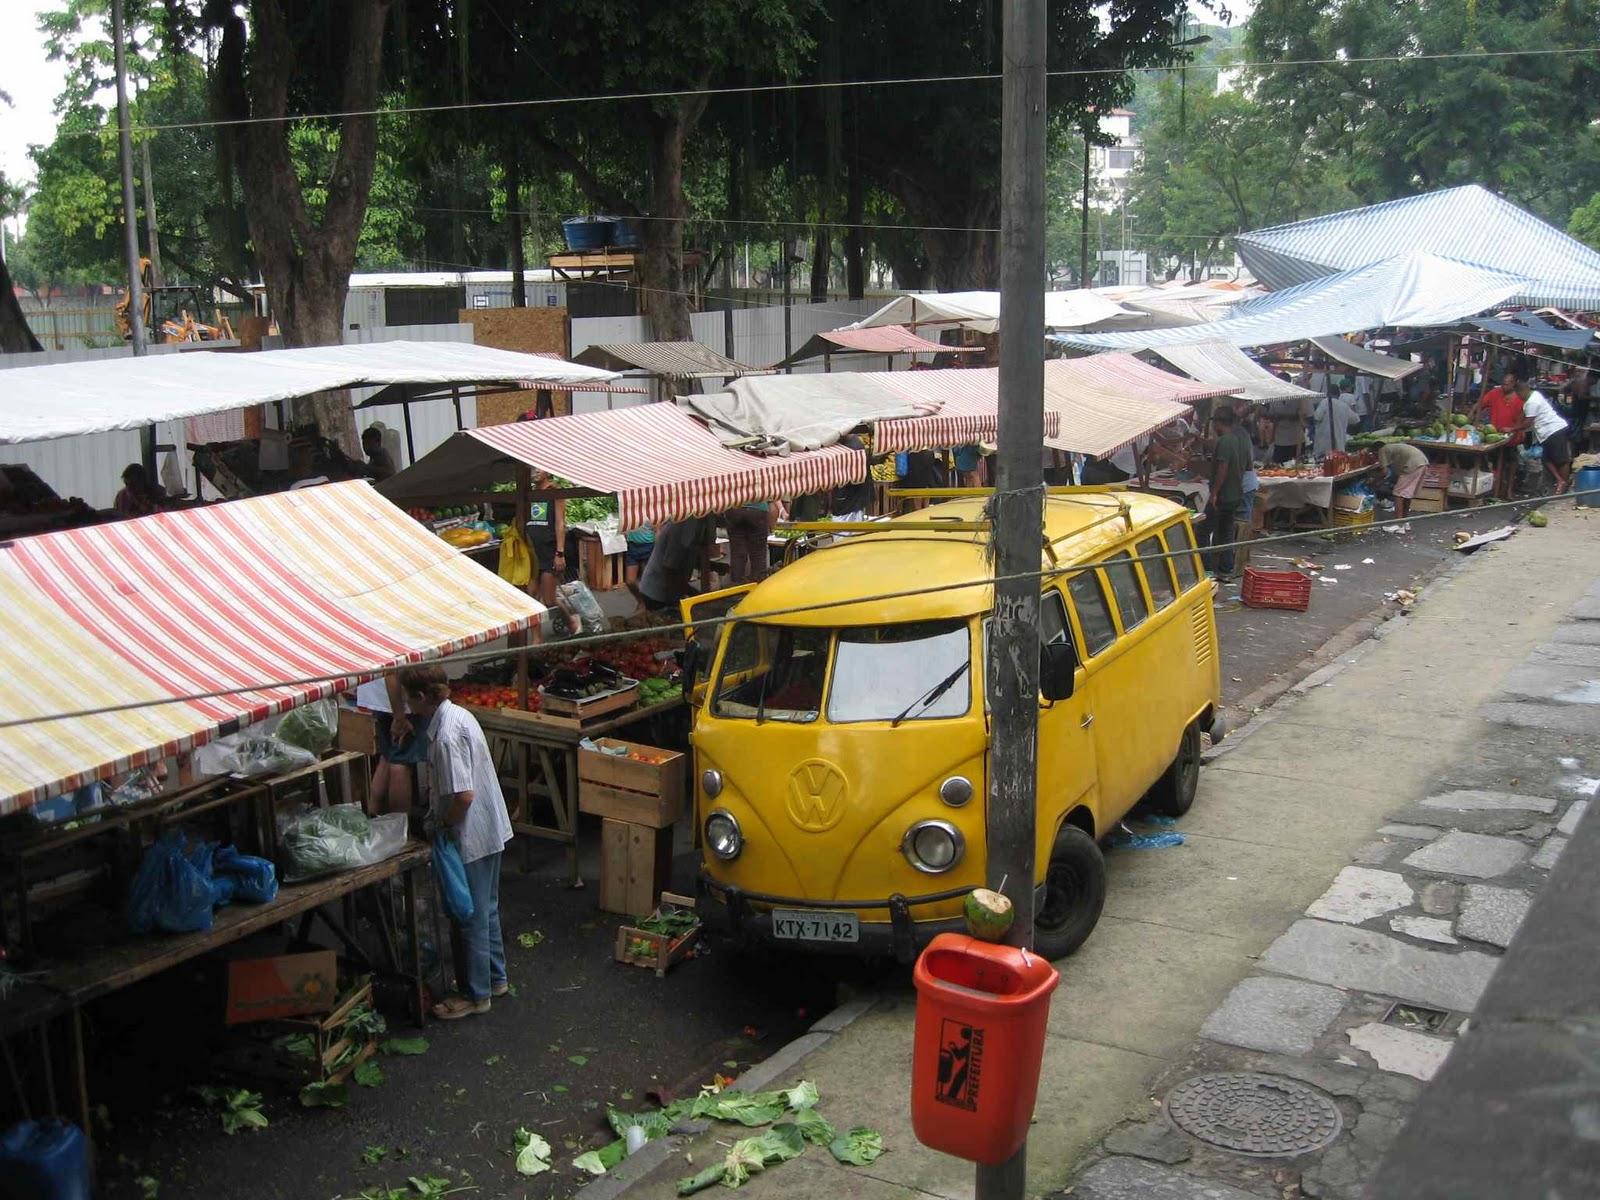 weird vegetables: Glória Farmers' Market (G-L-O-R-I-A!)